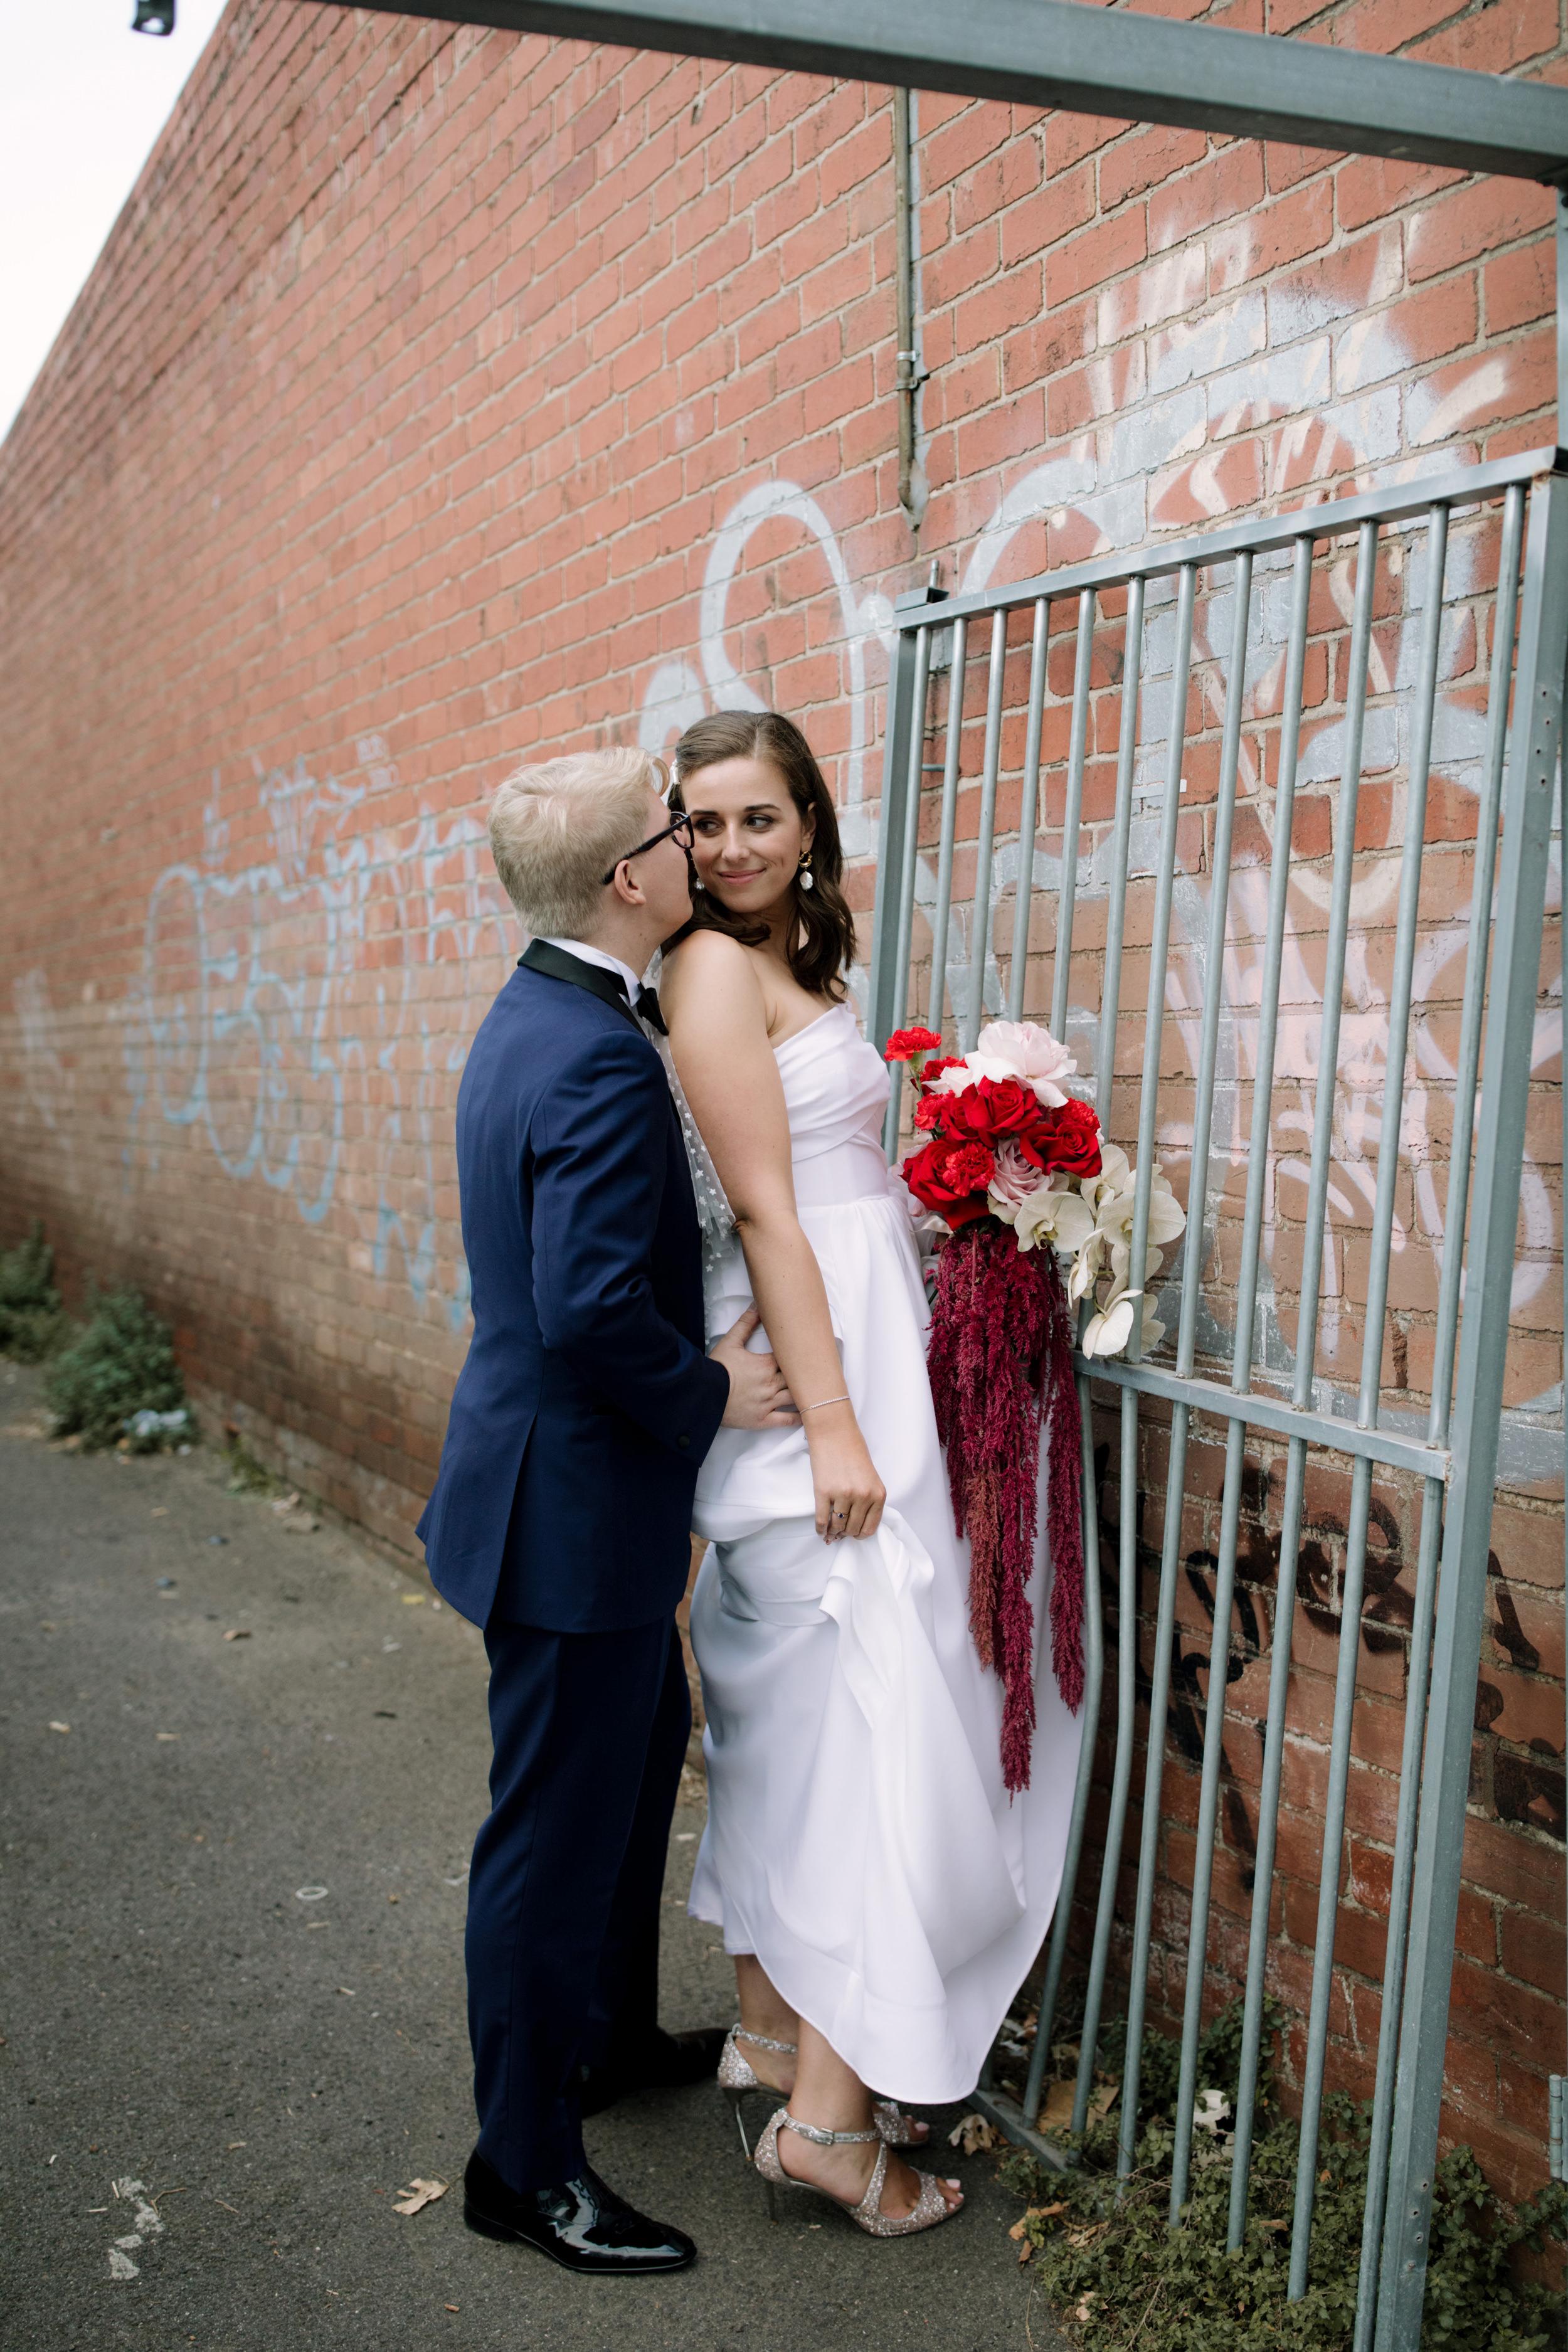 I-Got-You-Babe-Weddings-Tahlia&Mitch-Butler-Lane-Wedding0238.JPG